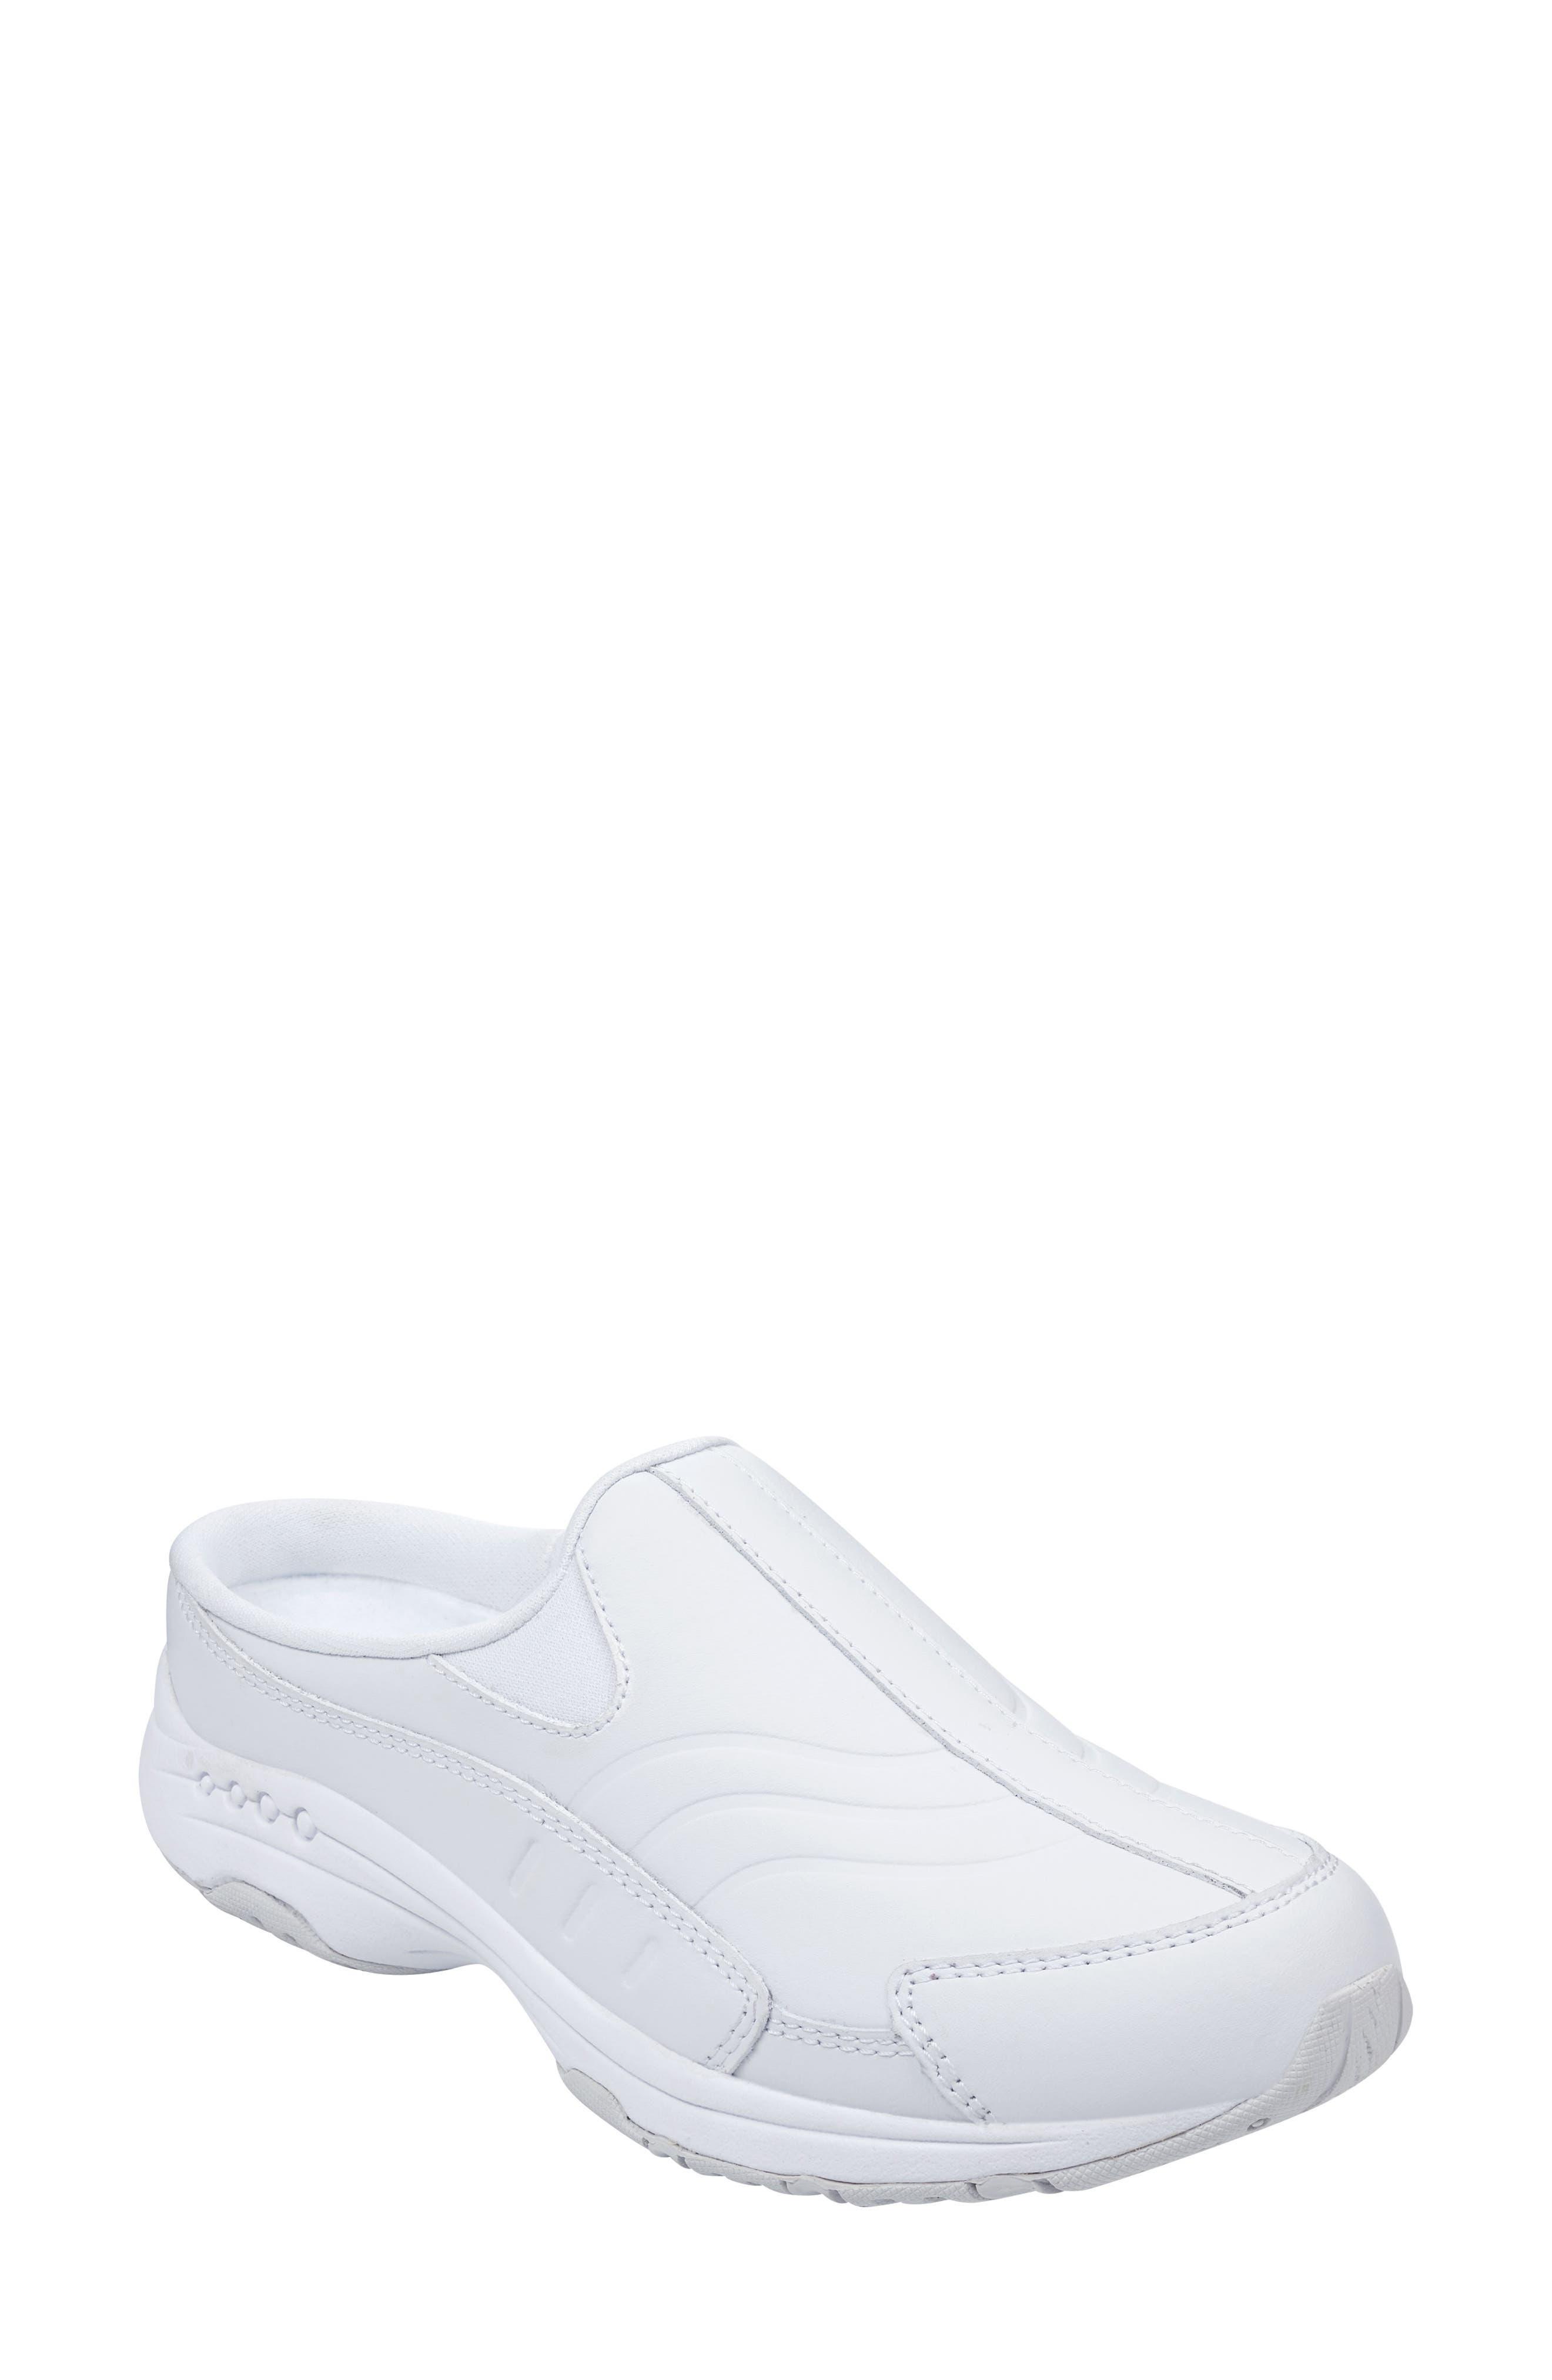 Tourguide Sneaker